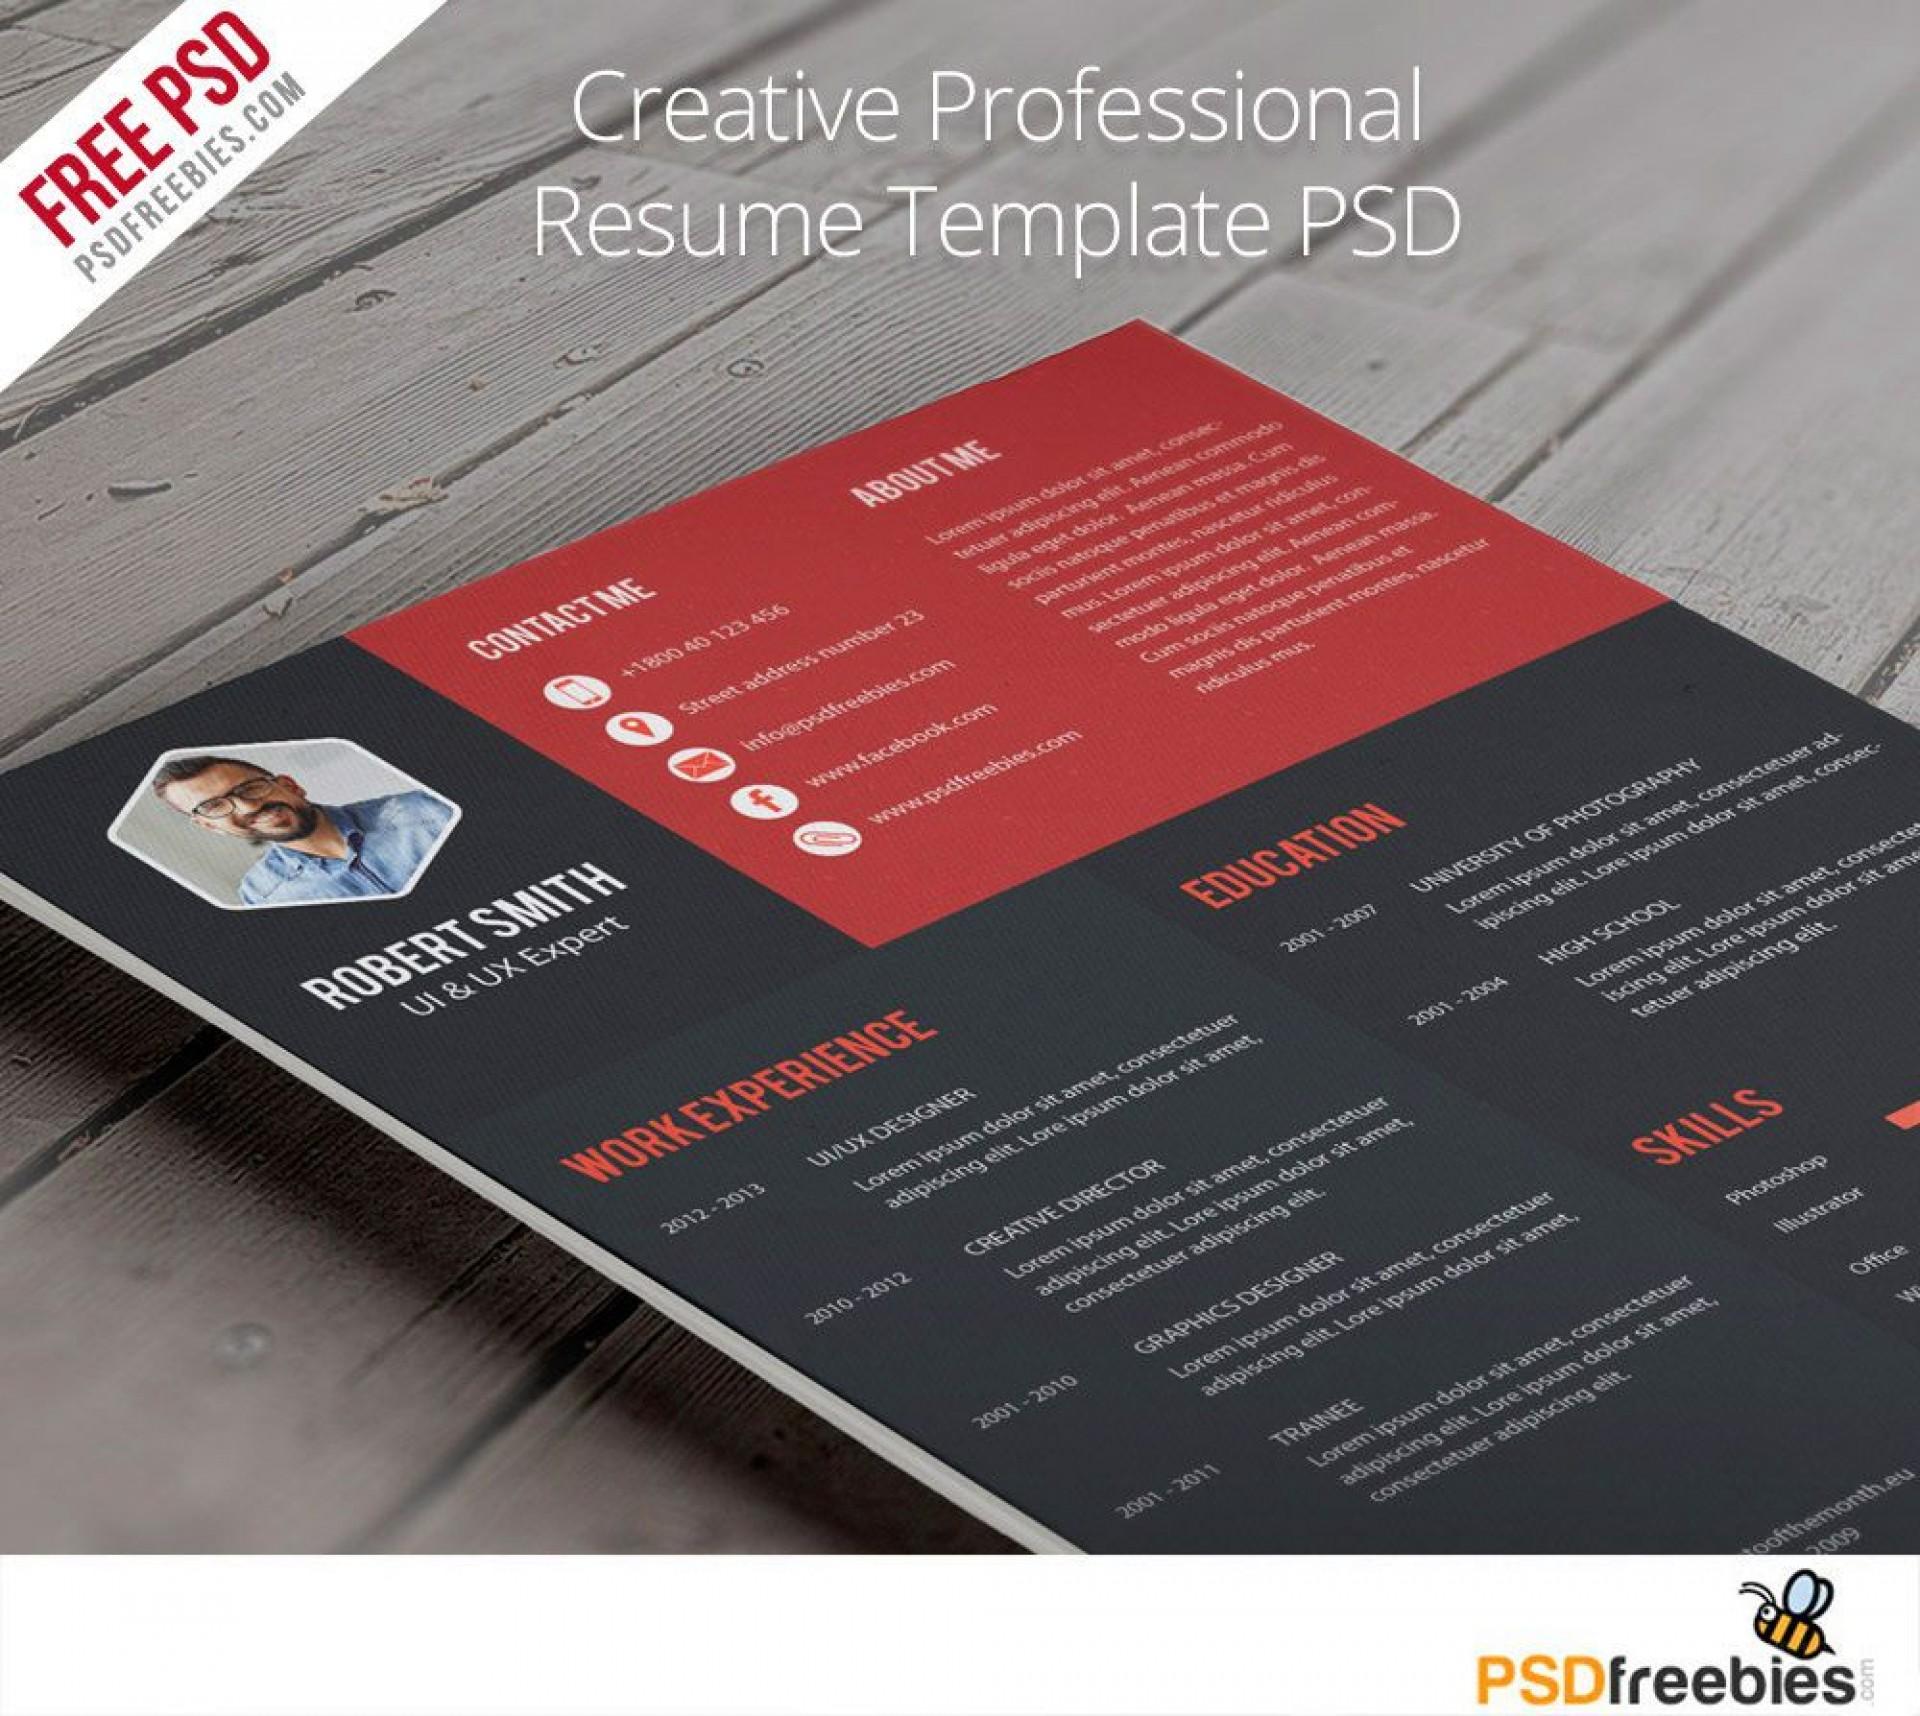 005 Dreaded Creative Resume Template Free Download Psd Idea  Cv1920